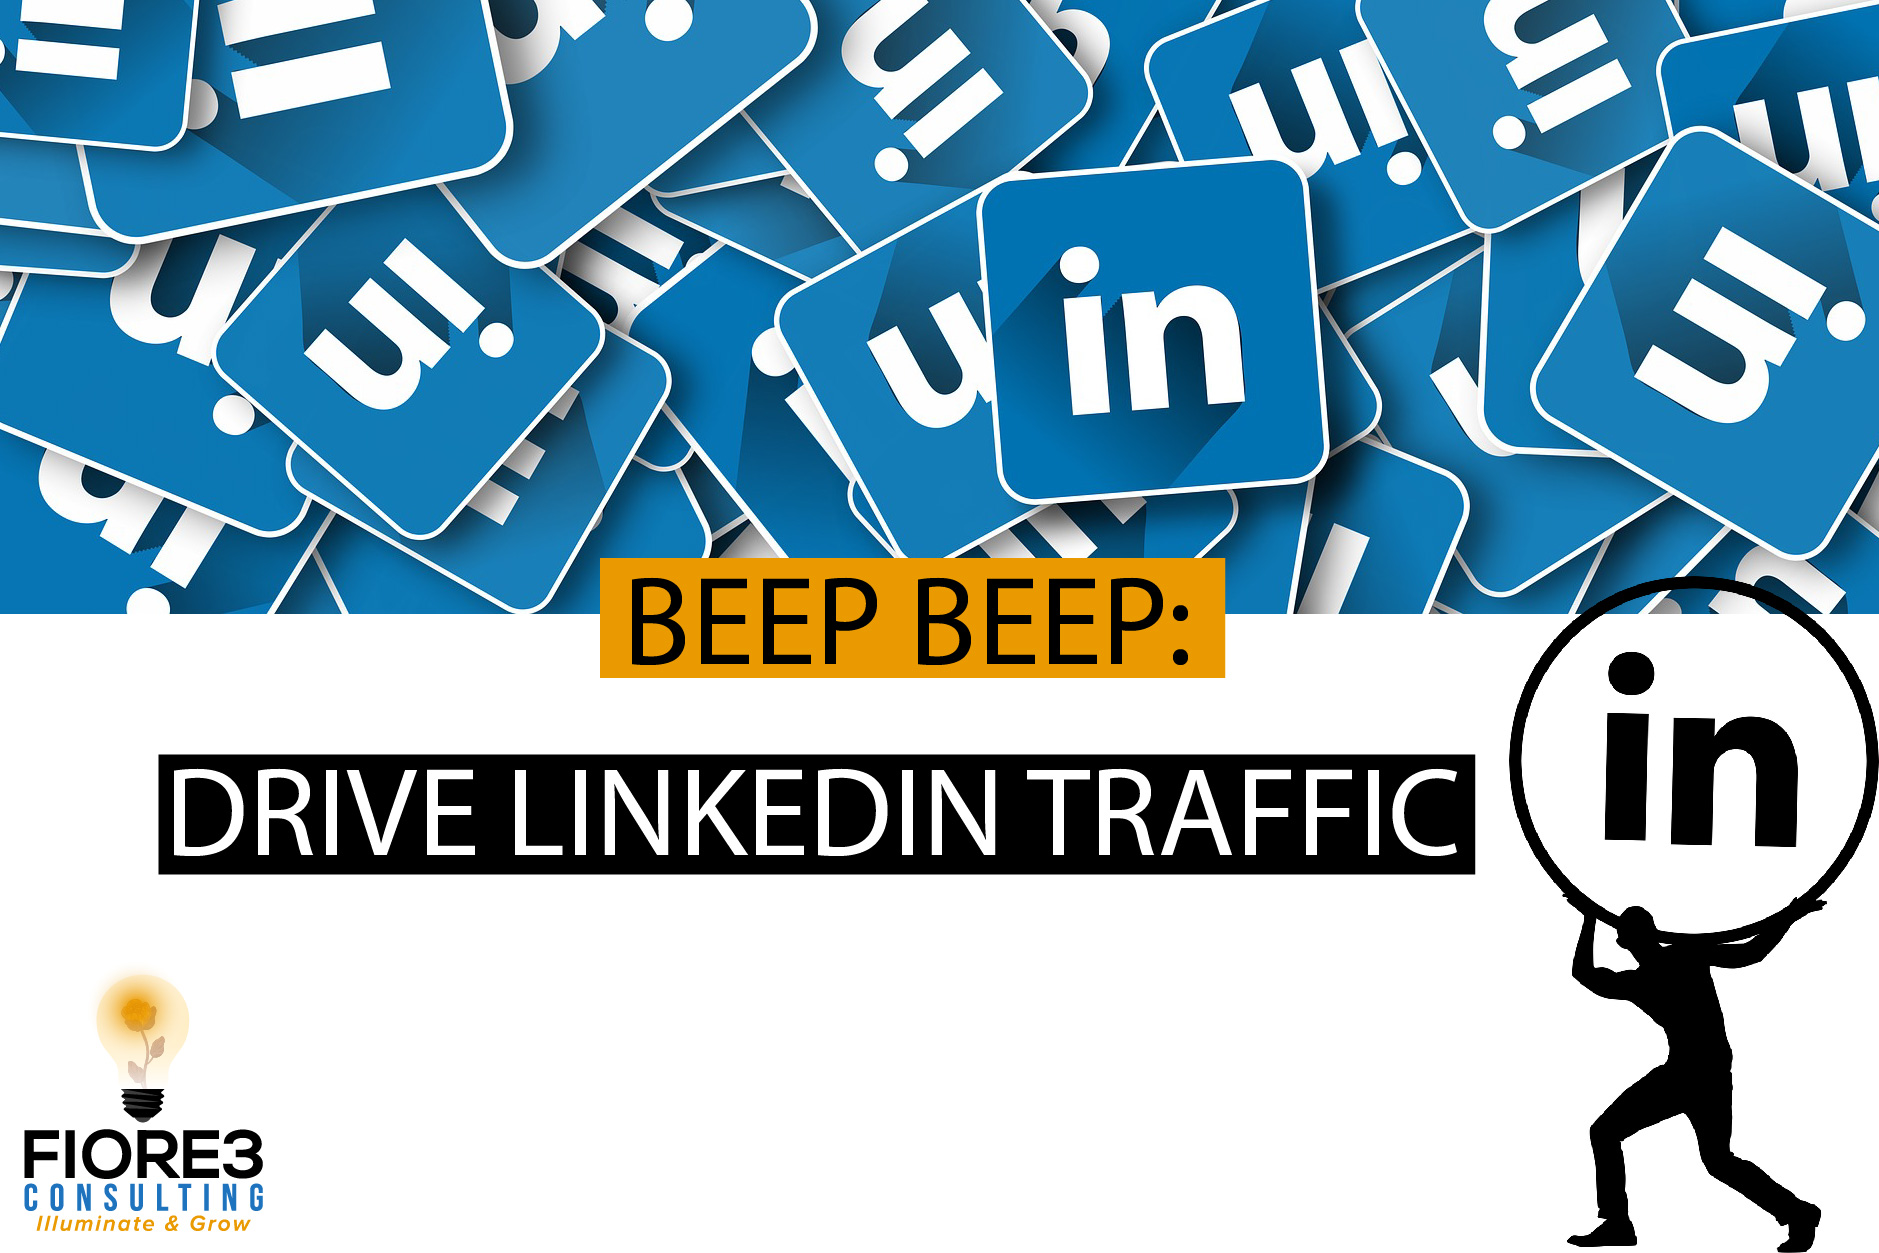 Drive LinkedIn Traffic